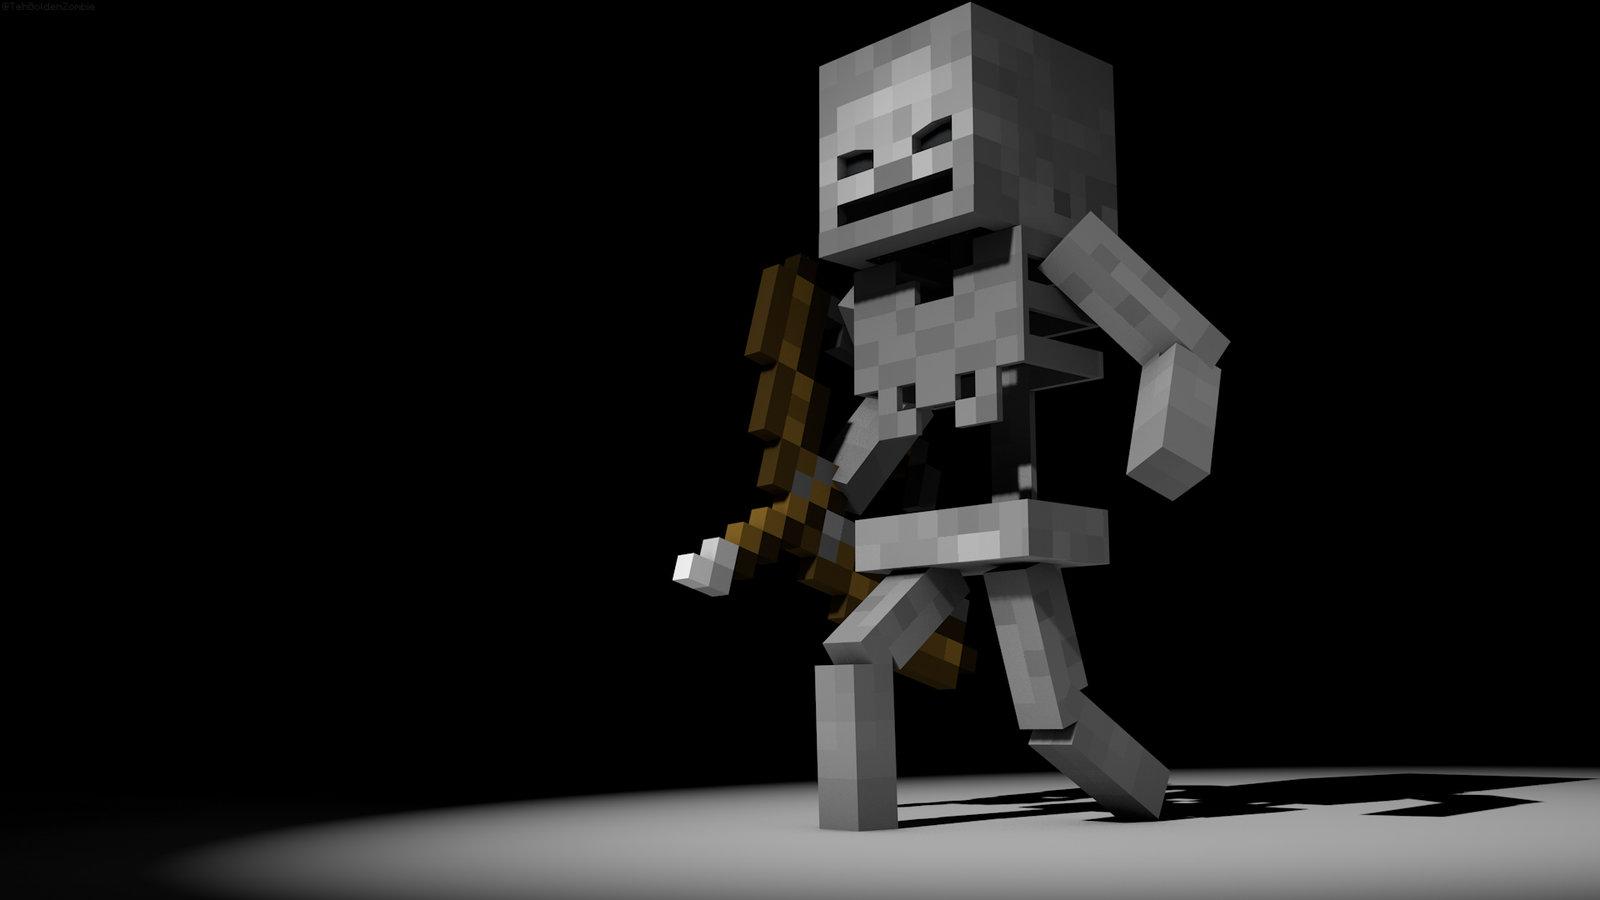 Image in the spotlight skeleton hd minecraft wallpaper for Crazy craft 3 0 server